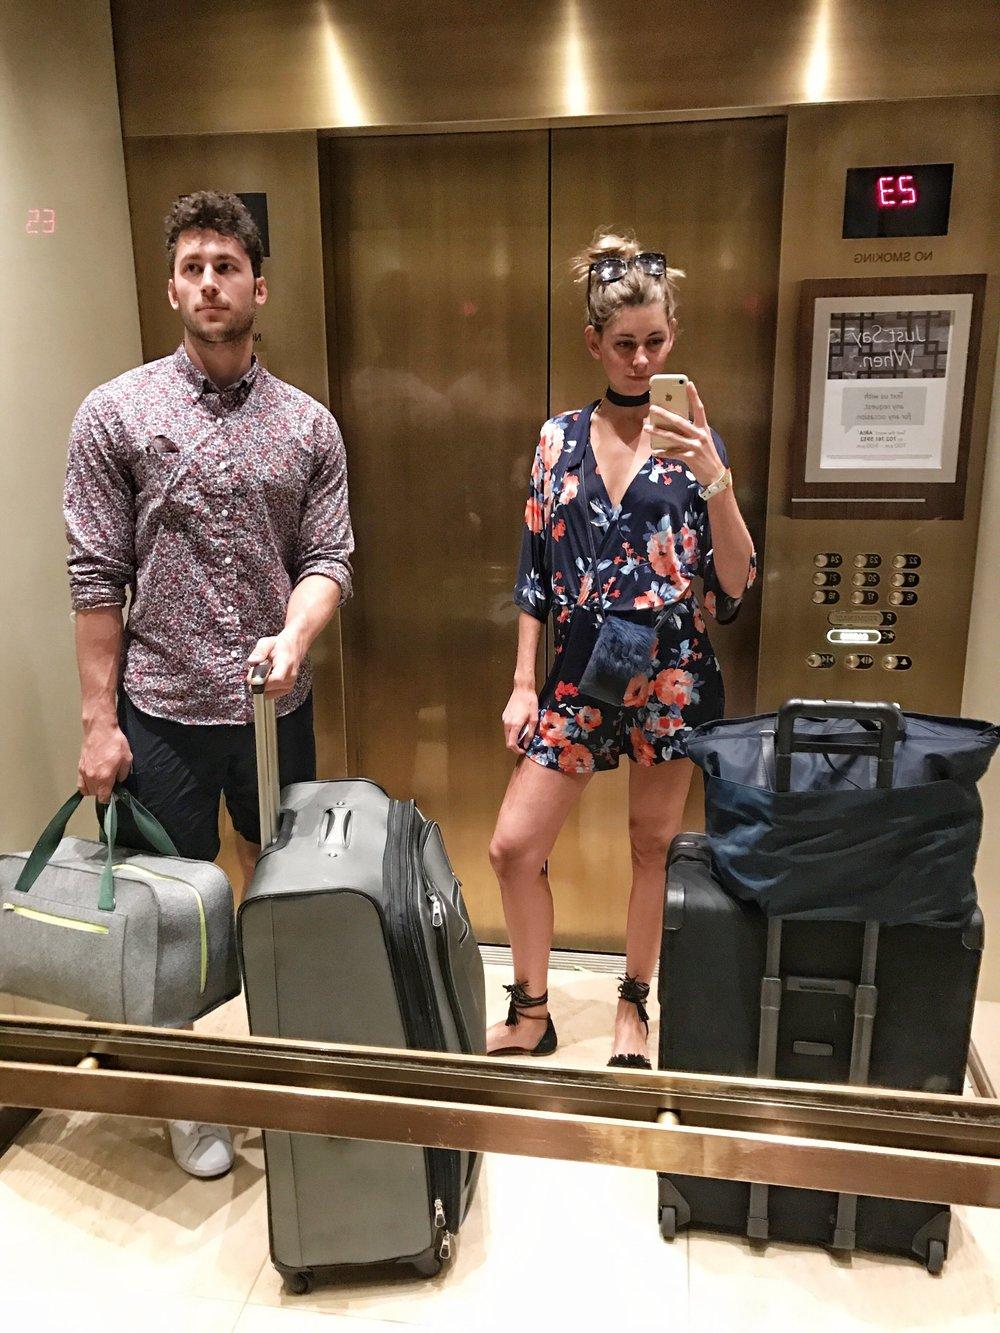 Las+Vegas+couples outfit.jpg